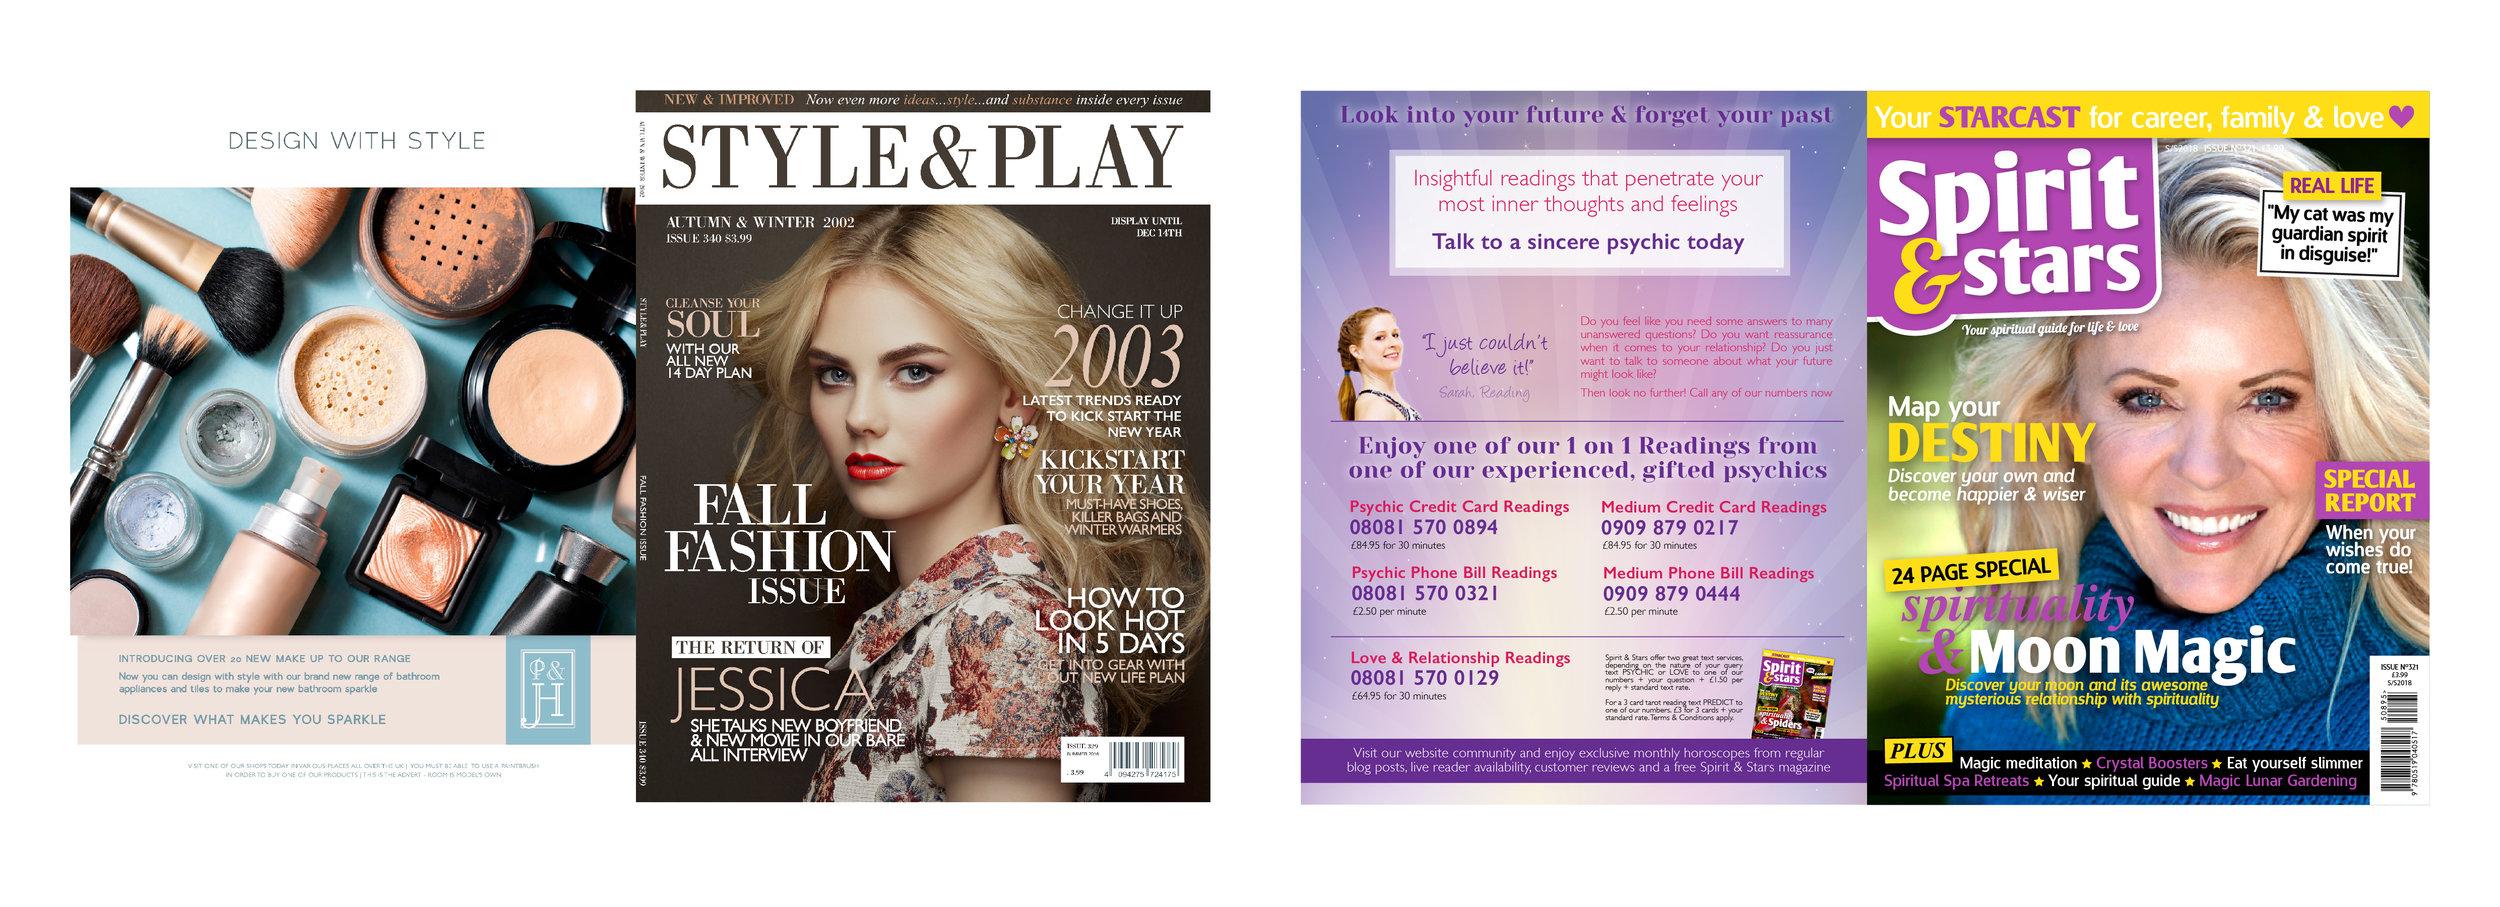 magazines_FINAL-02.jpg